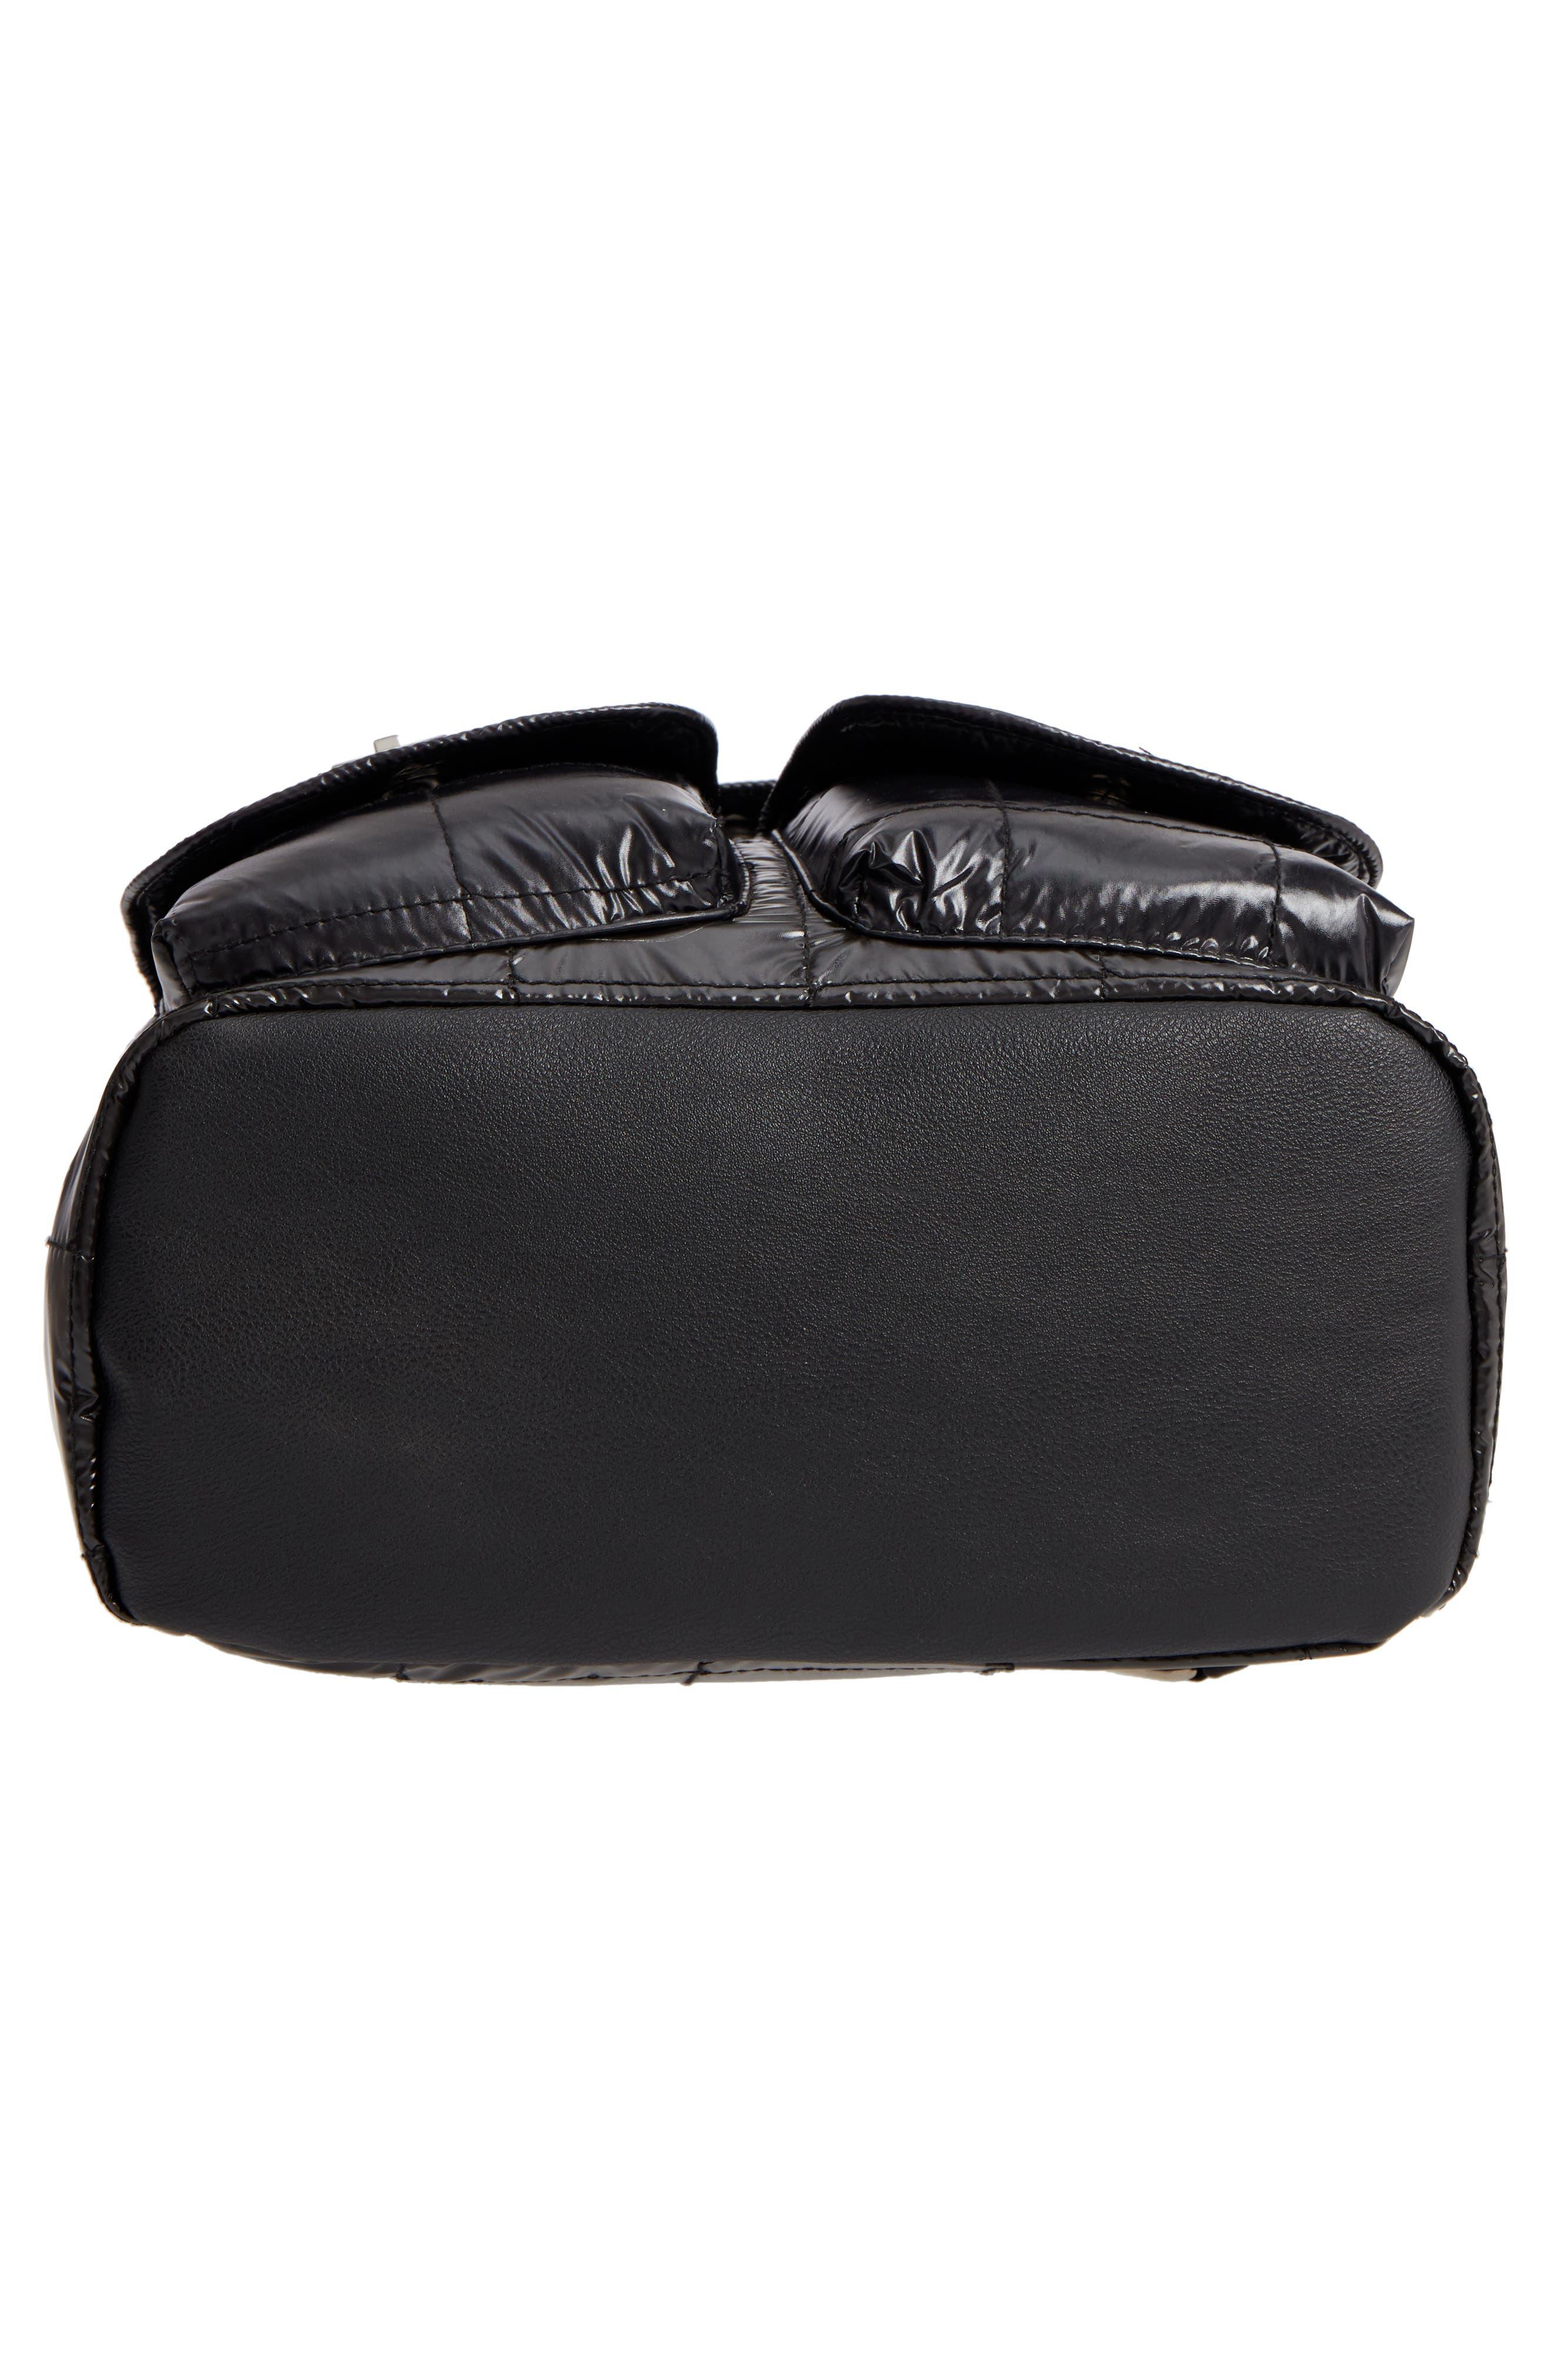 Puffer Backpack,                             Alternate thumbnail 4, color,                             Black